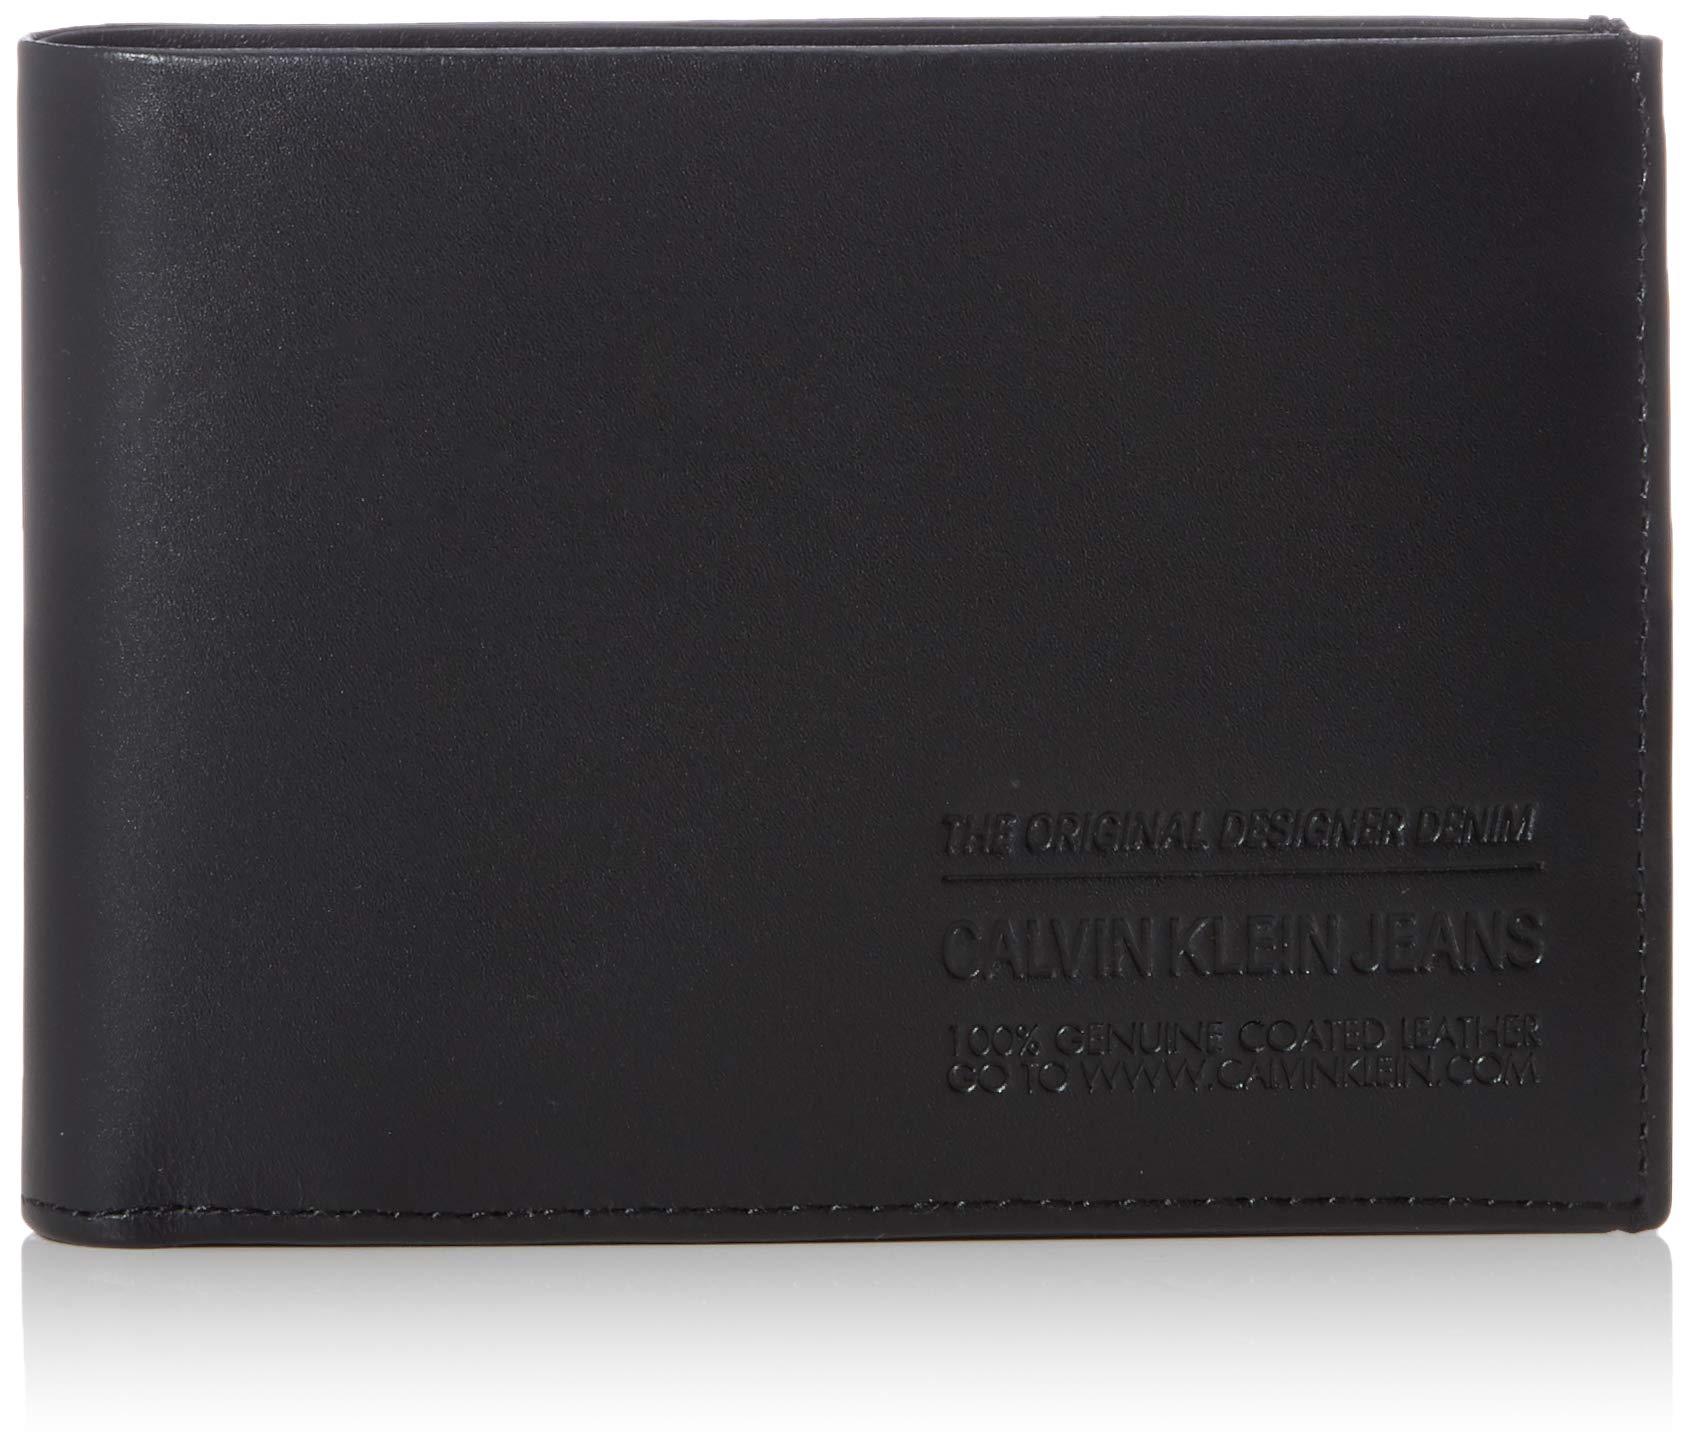 W Cmw Portés Box Billfold Épaule Black1x1x1 H L Ckj HommeNoirinfinite X Calvin coinSacs Office Klein jc4ASR3q5L